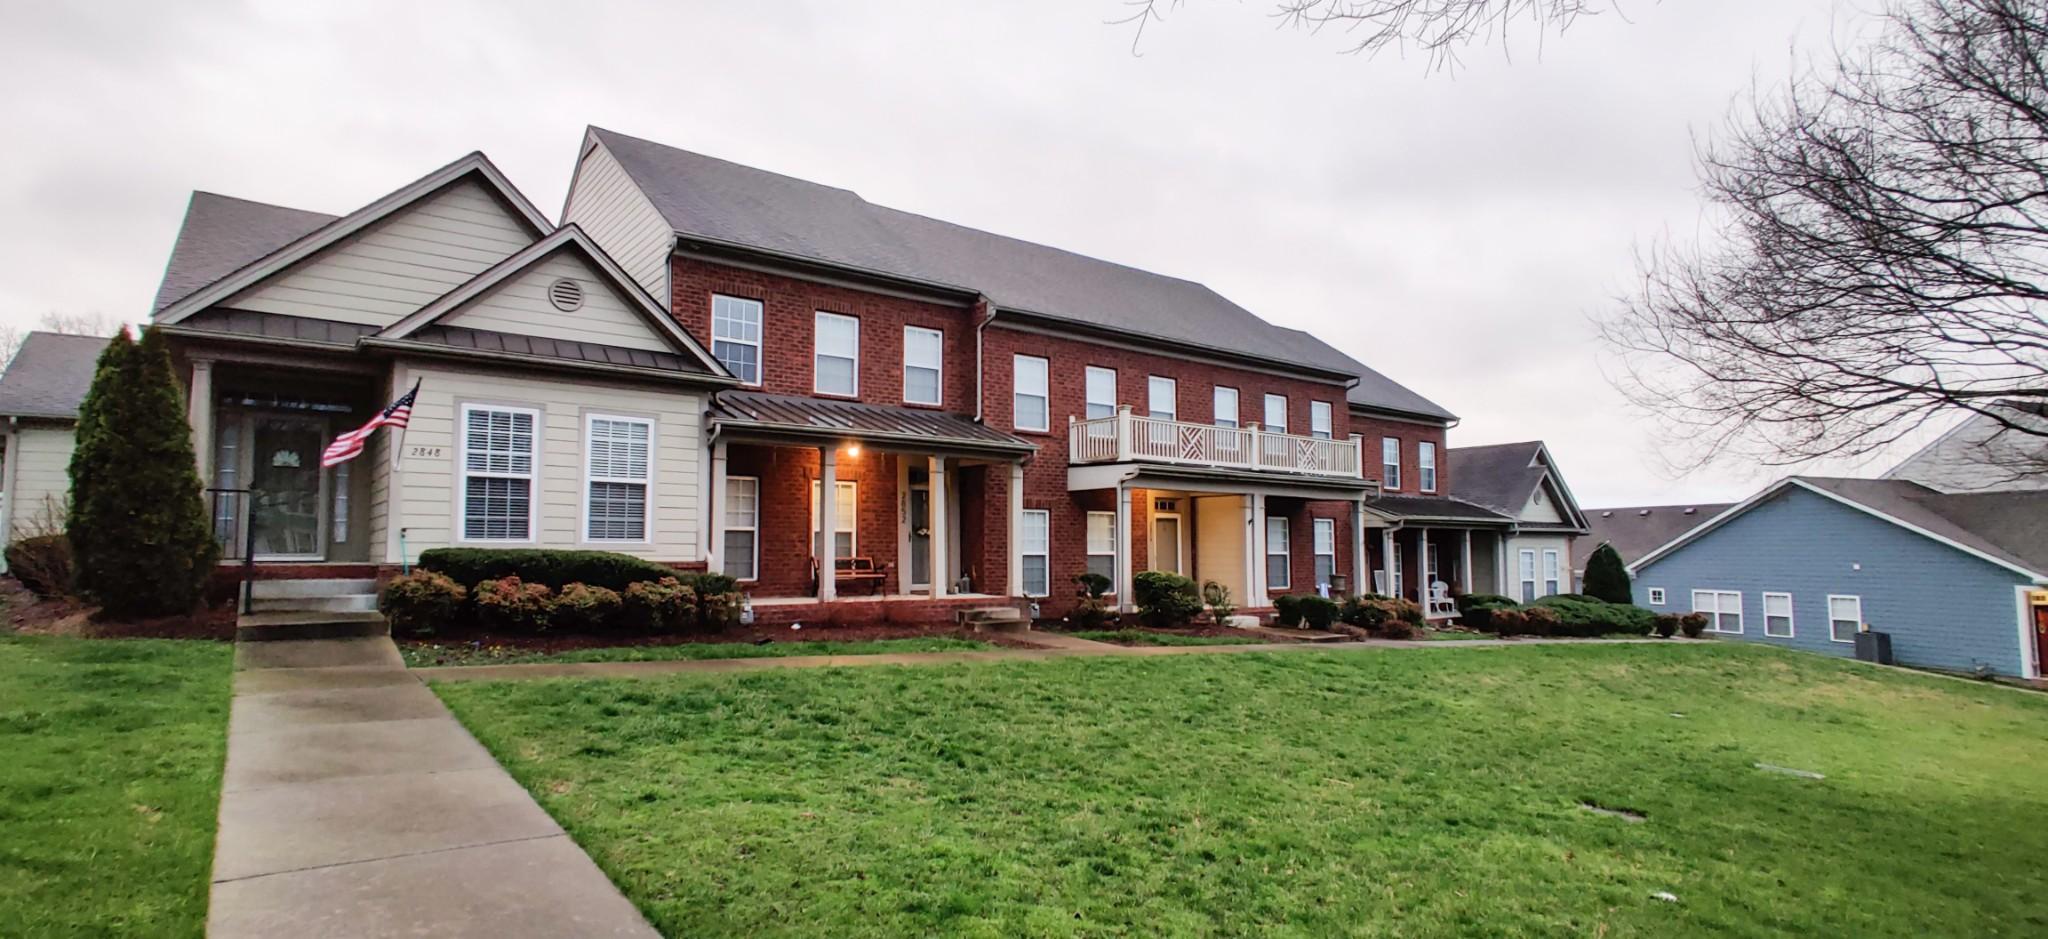 2852 Adara Ln, Nashville, TN 37211 - Nashville, TN real estate listing